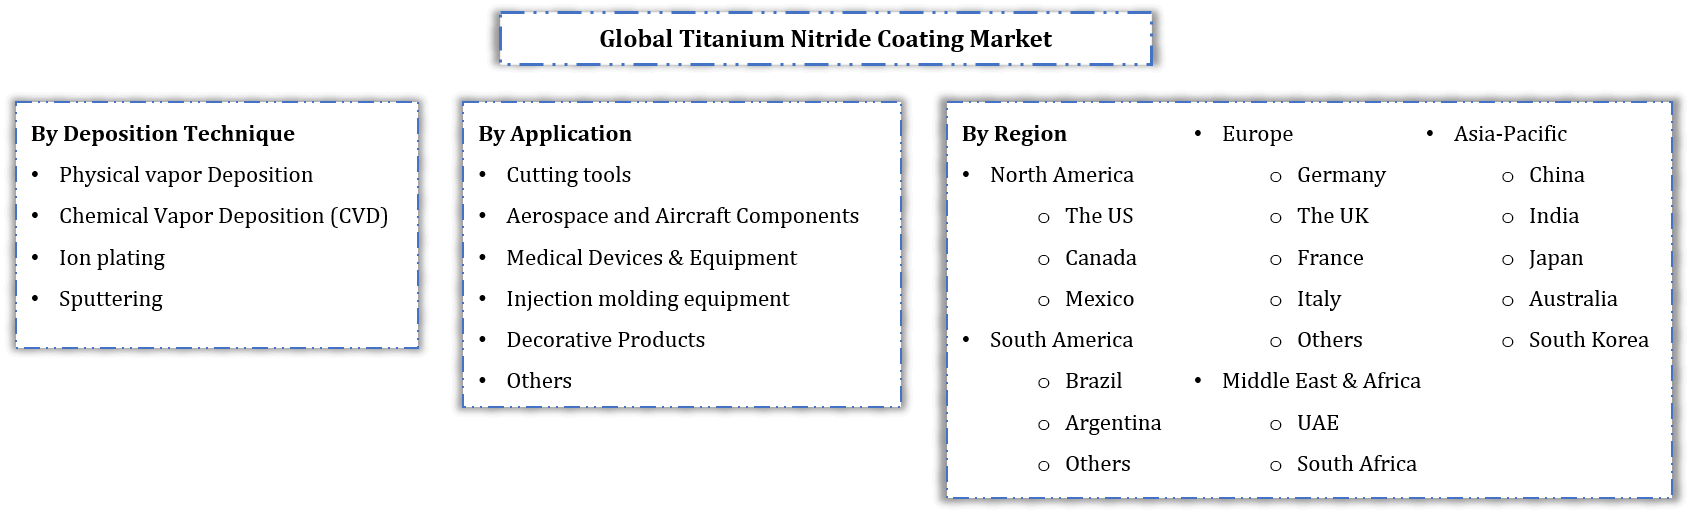 Global Titanium Nitride Coating Market Segmentation